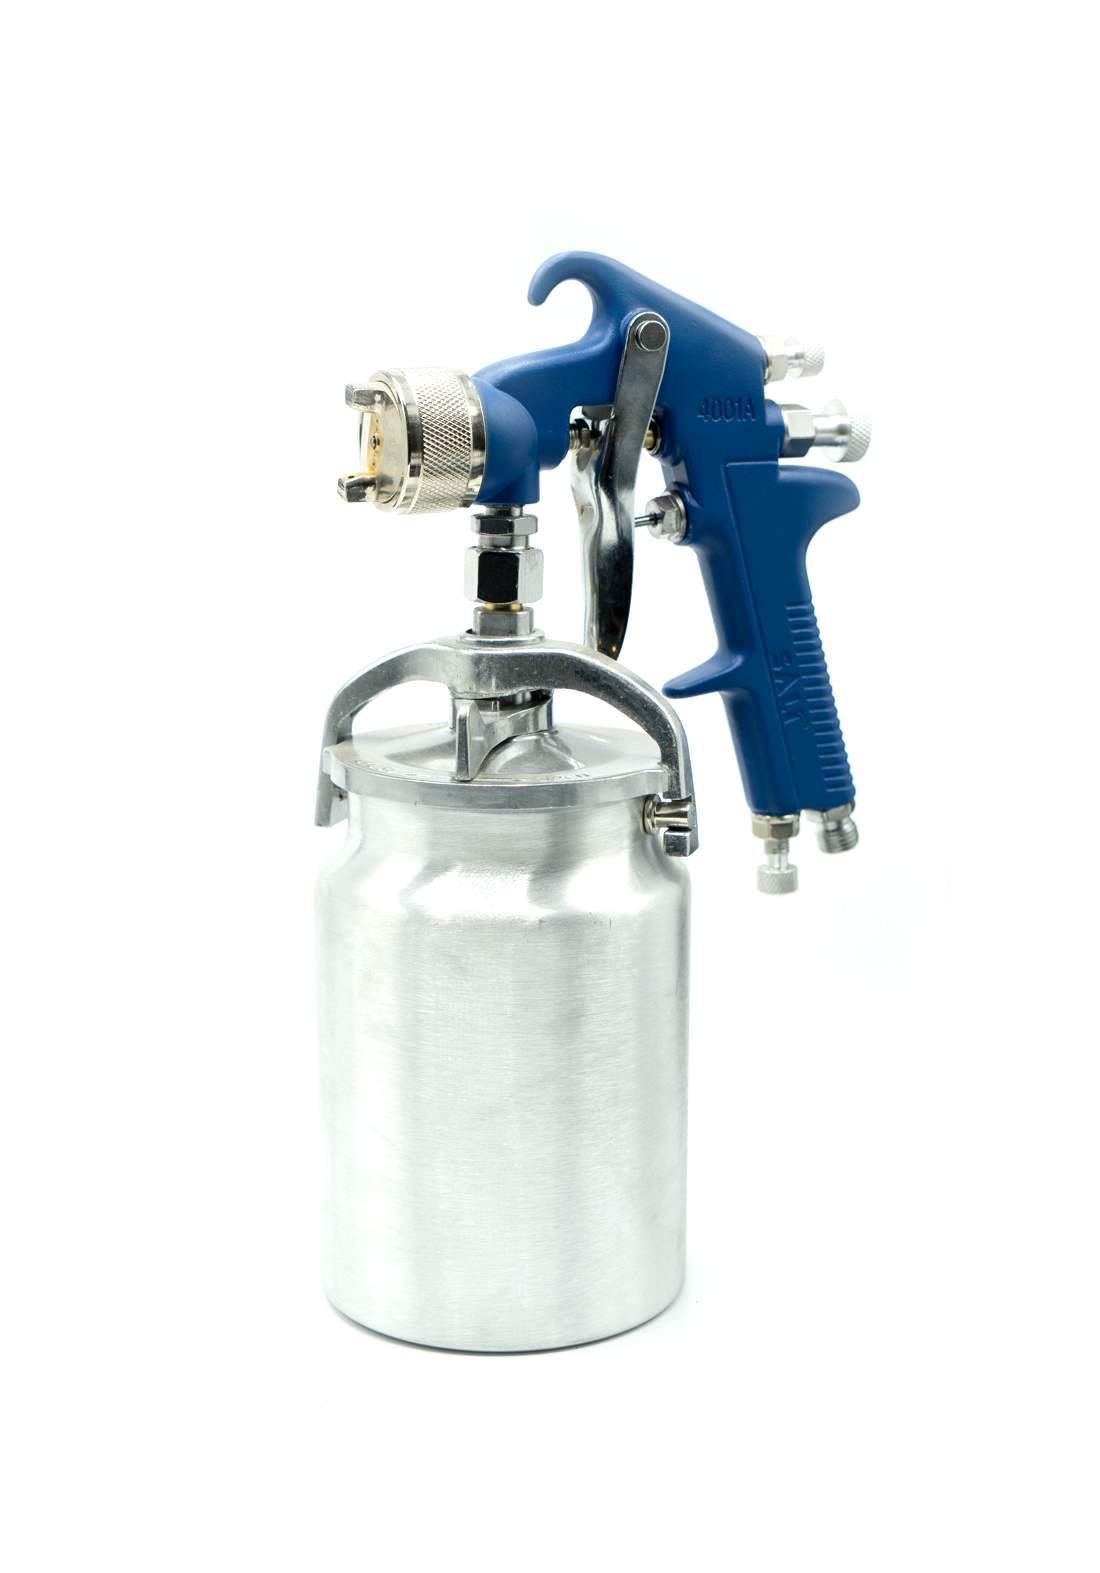 Sali Q034001A Hvlp spray gun 1000 ml مسدس طلاء